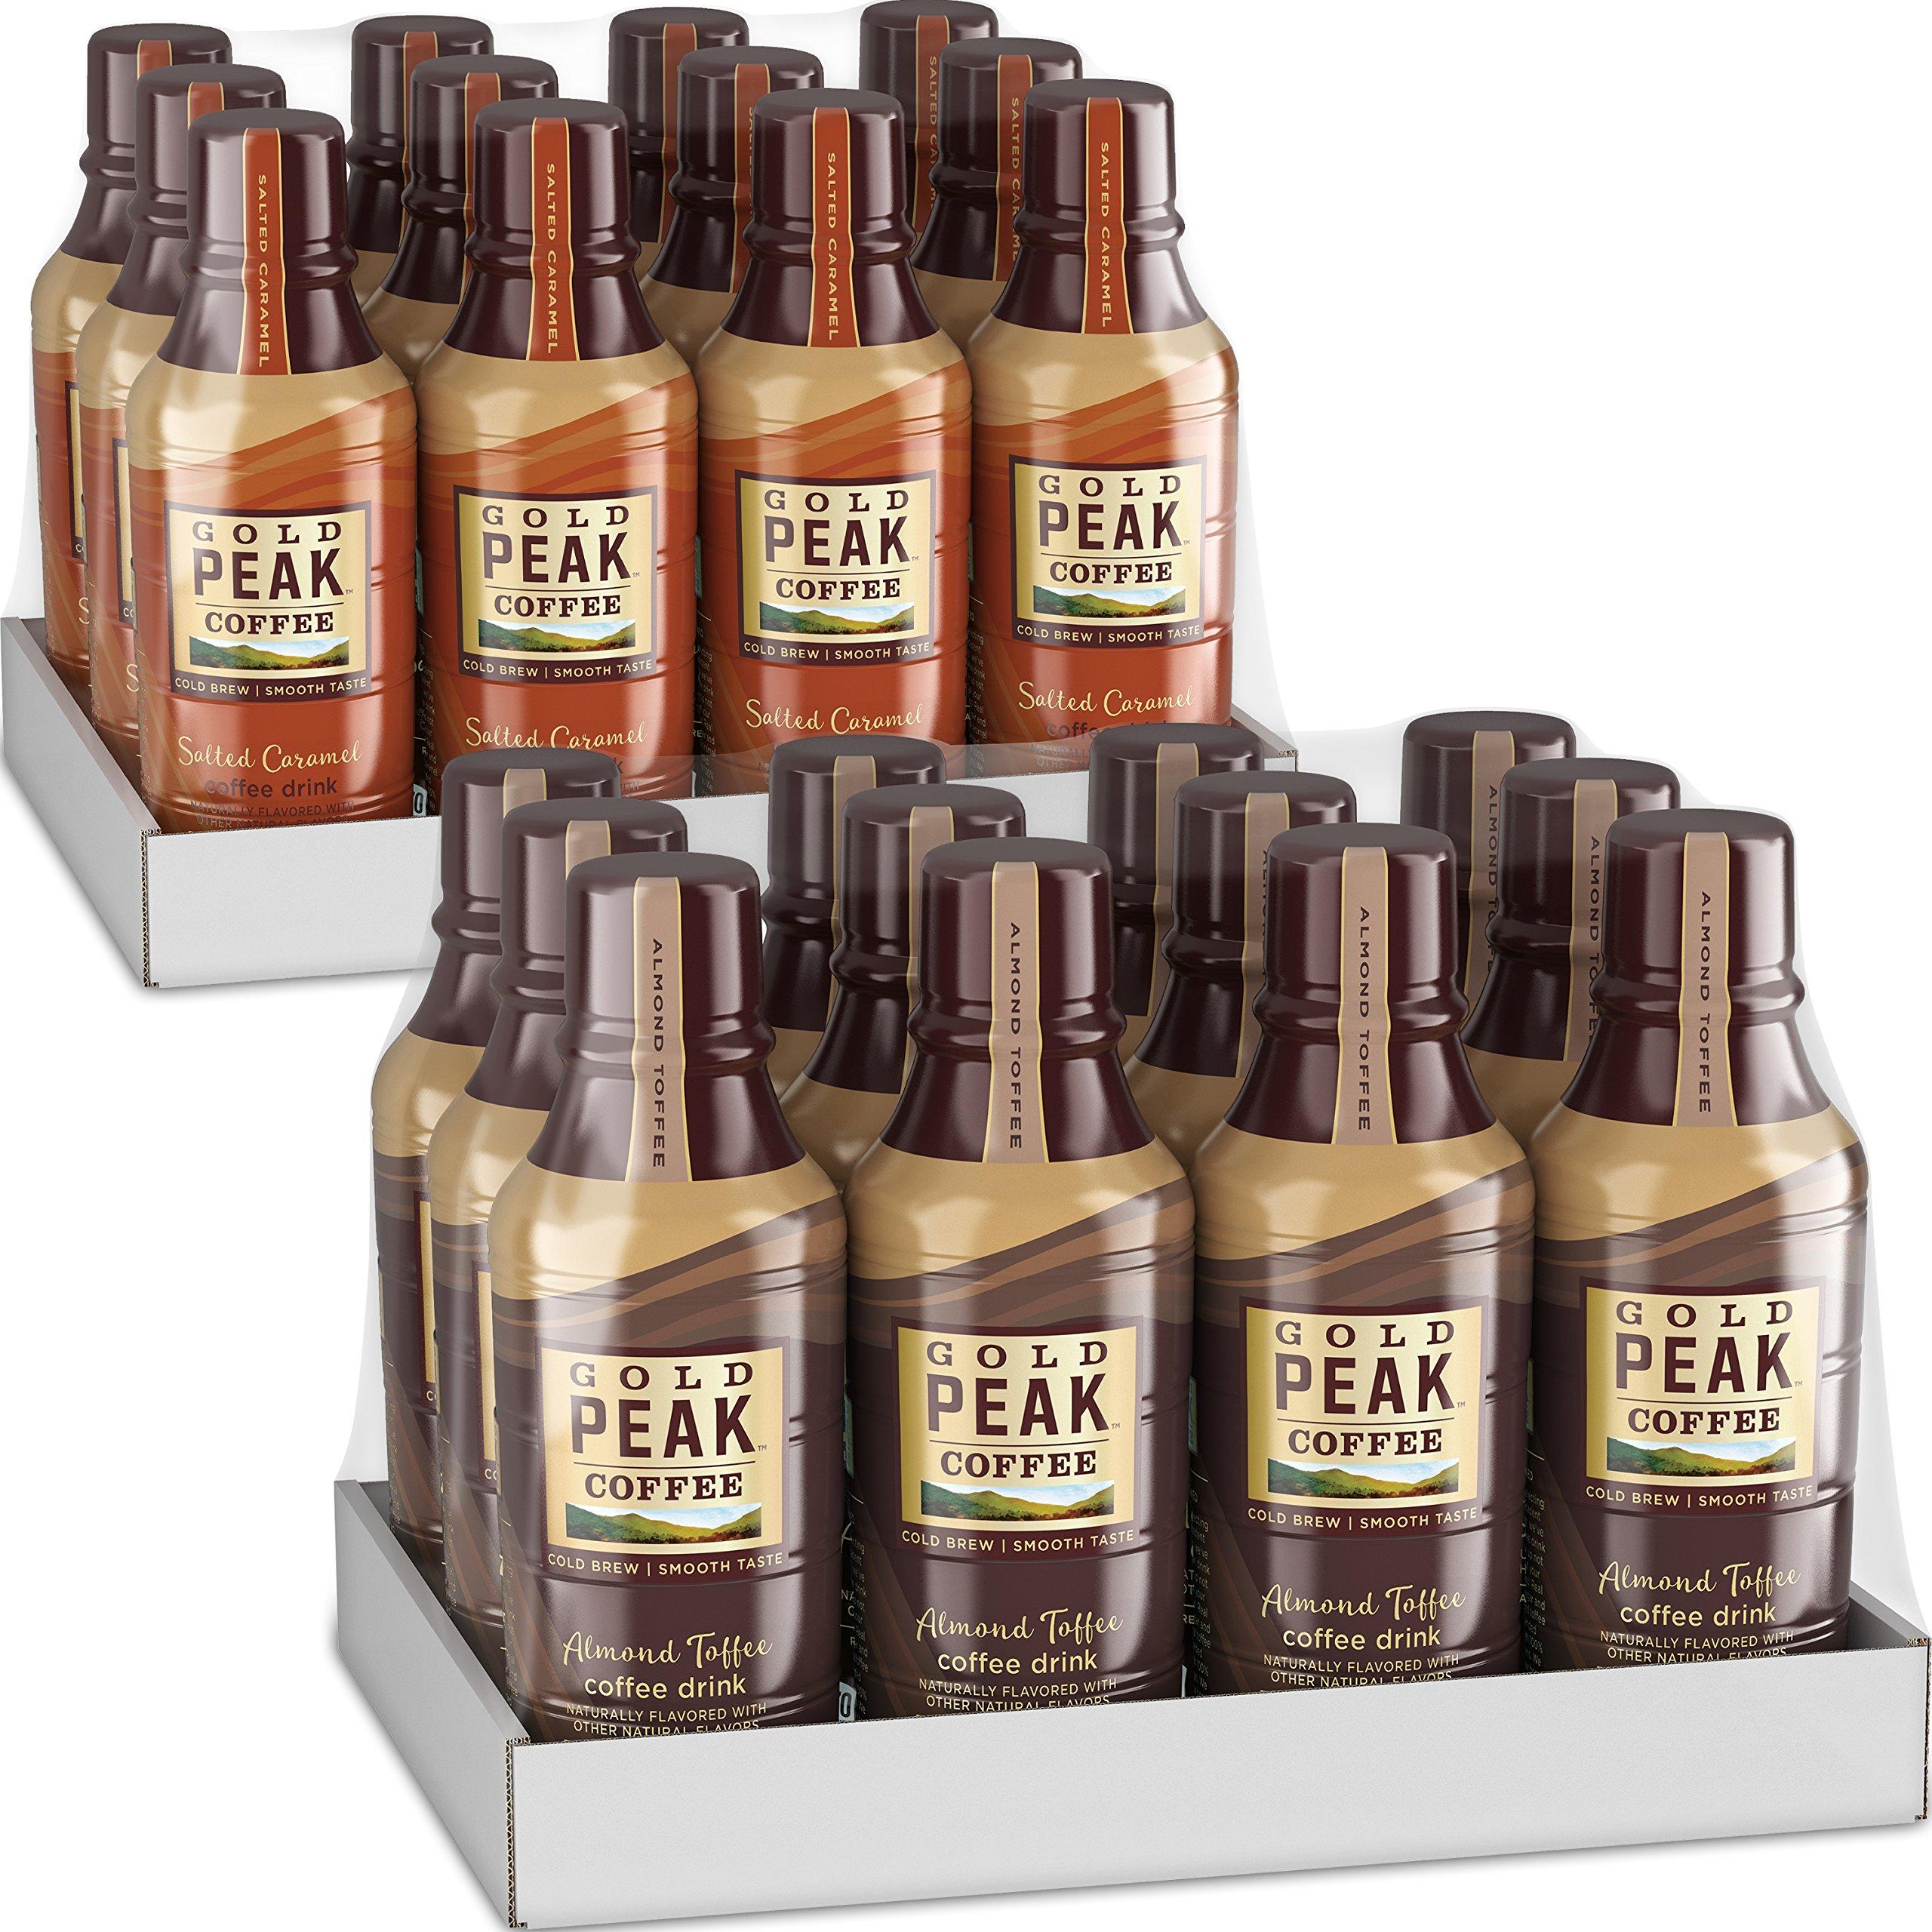 Gold Peak Variety Pack (Salted Caramel & Almond Toffee), 14 fl oz, 24 Pack by Gold Peak